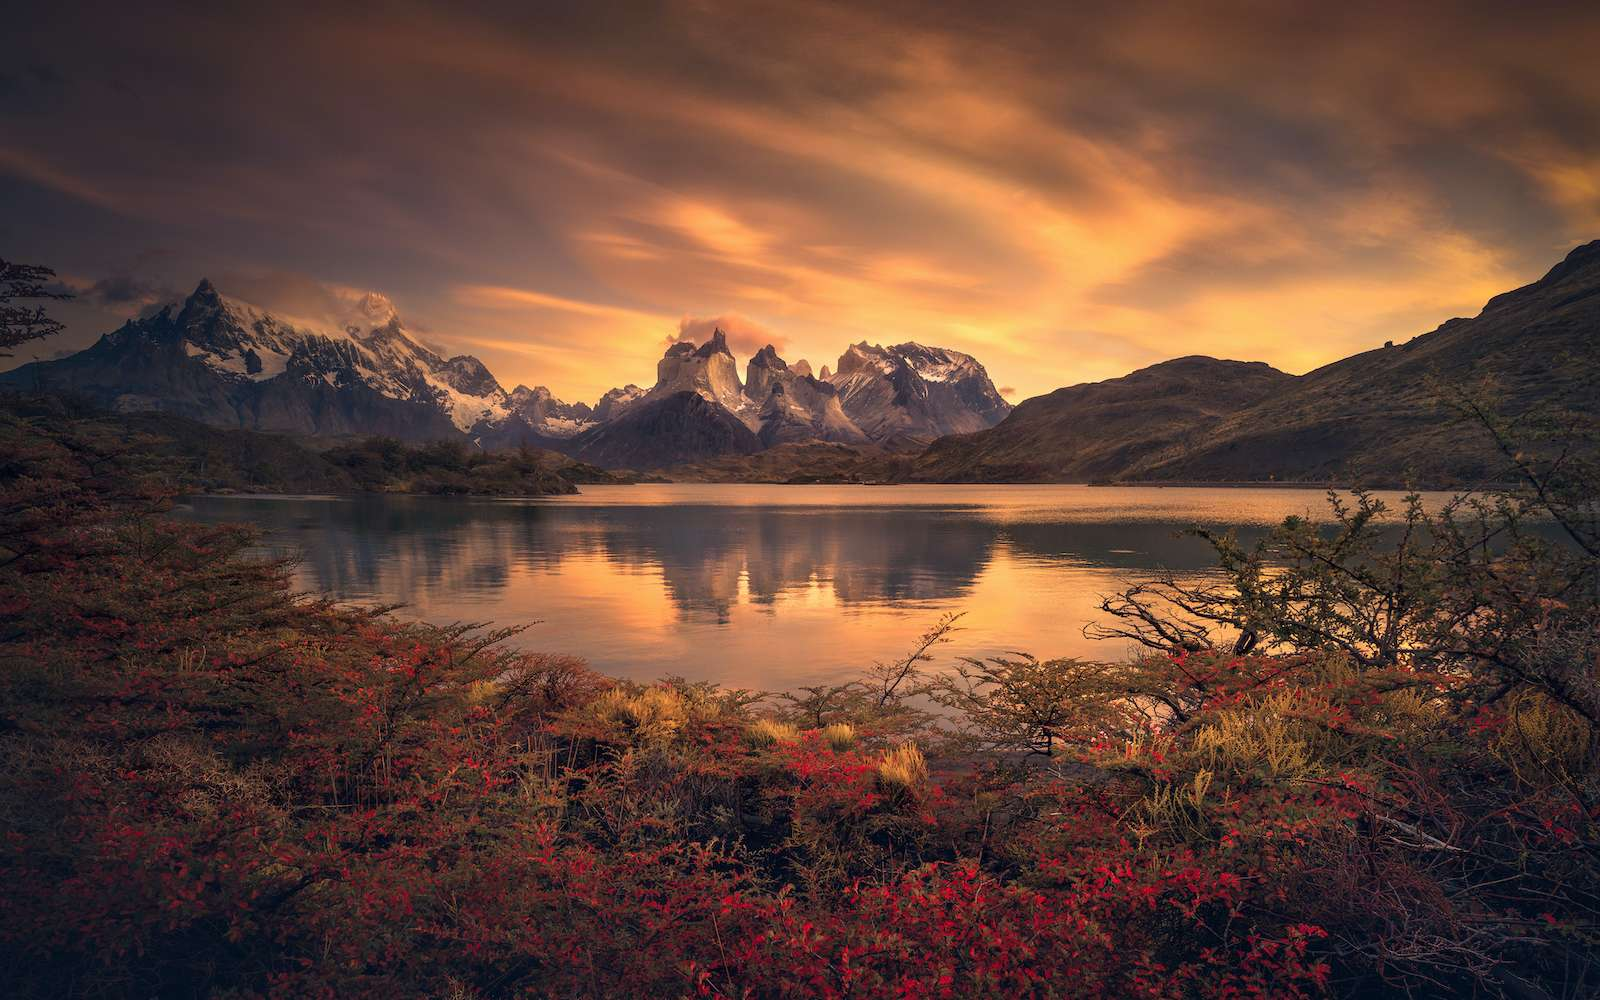 Le Grand Banquet, parc national Torres del Paine, Chili. © Yuekai Du, 2020 International Landscape Photographer of the Year Award